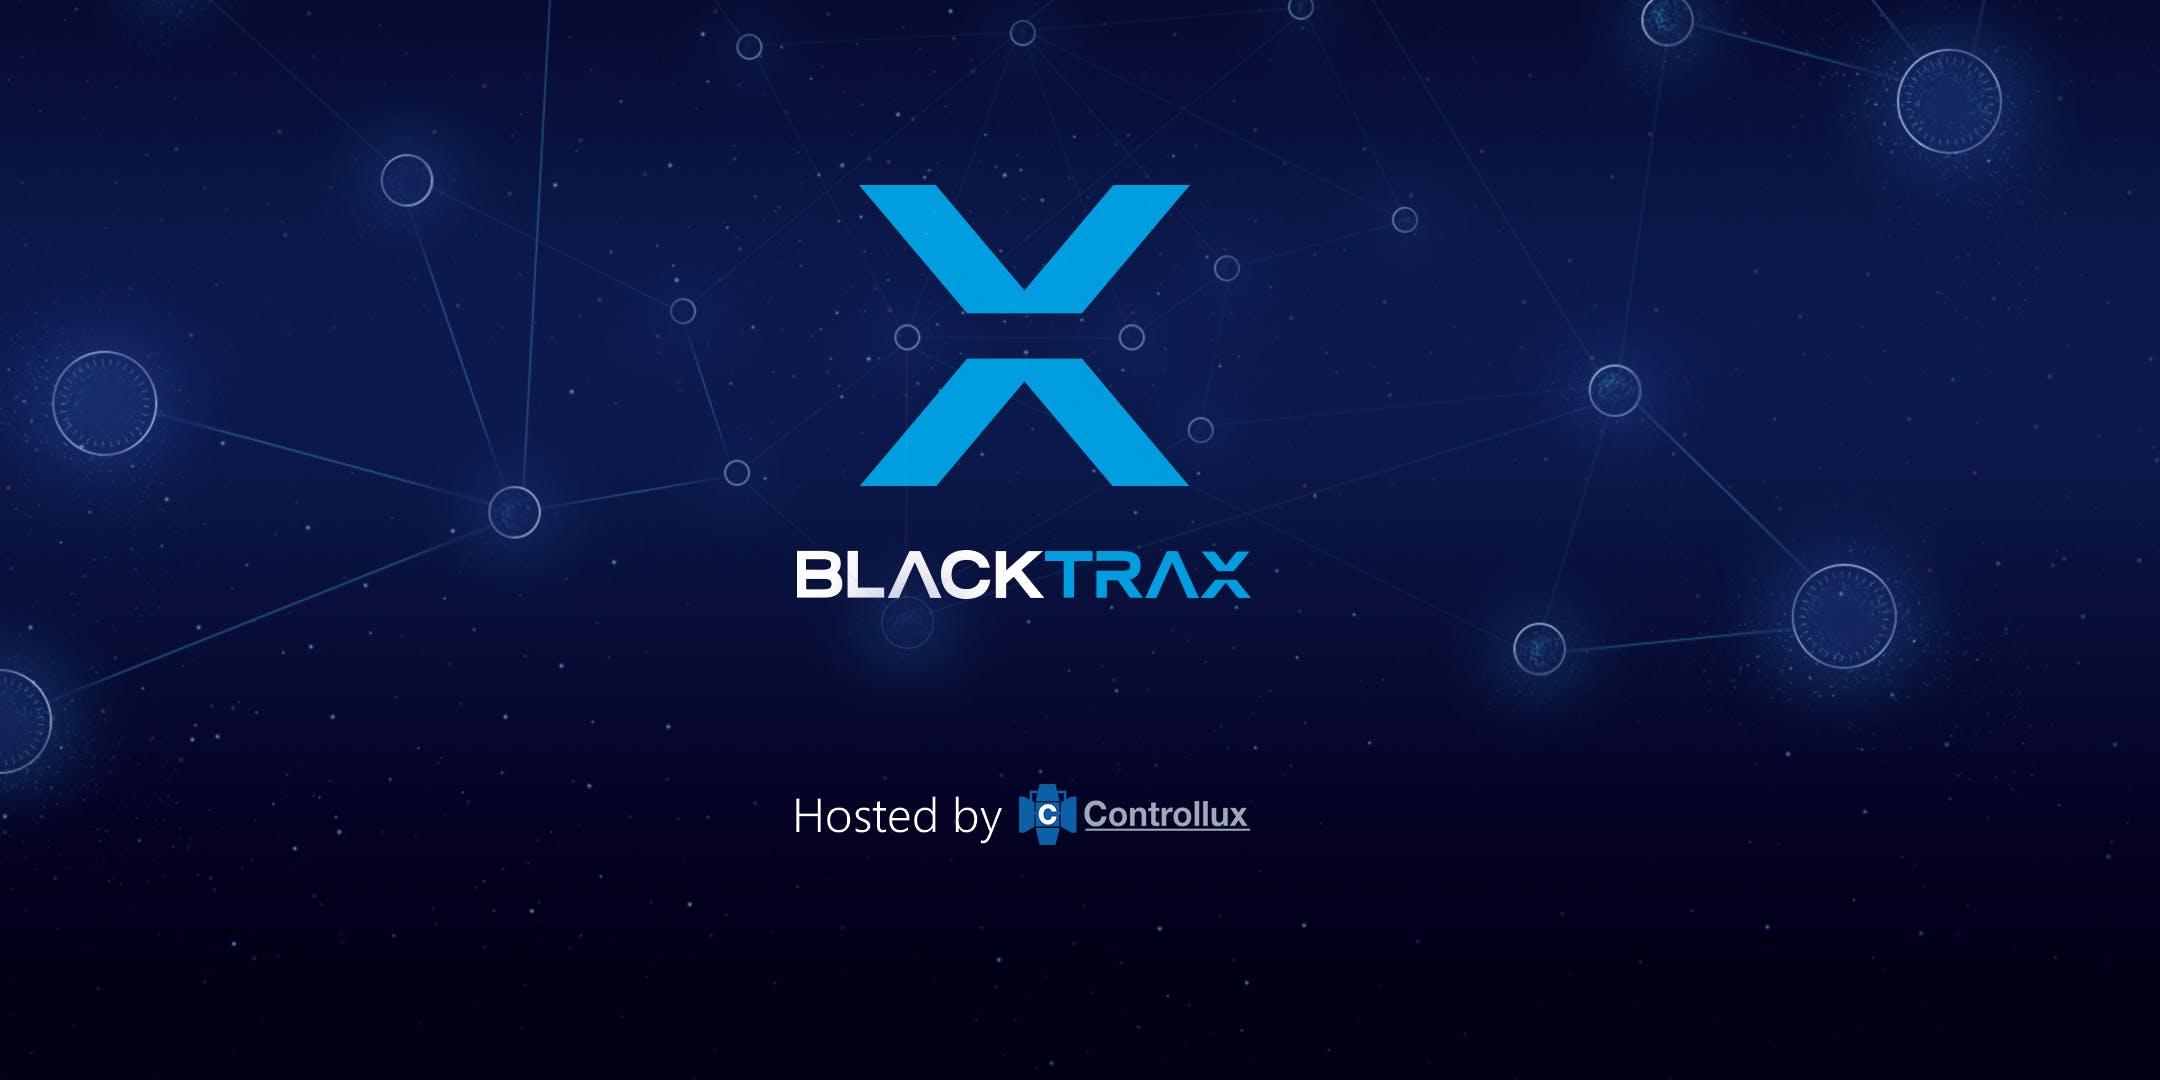 BlackTrax Technician Training - Alphen aan den Rijn, NL